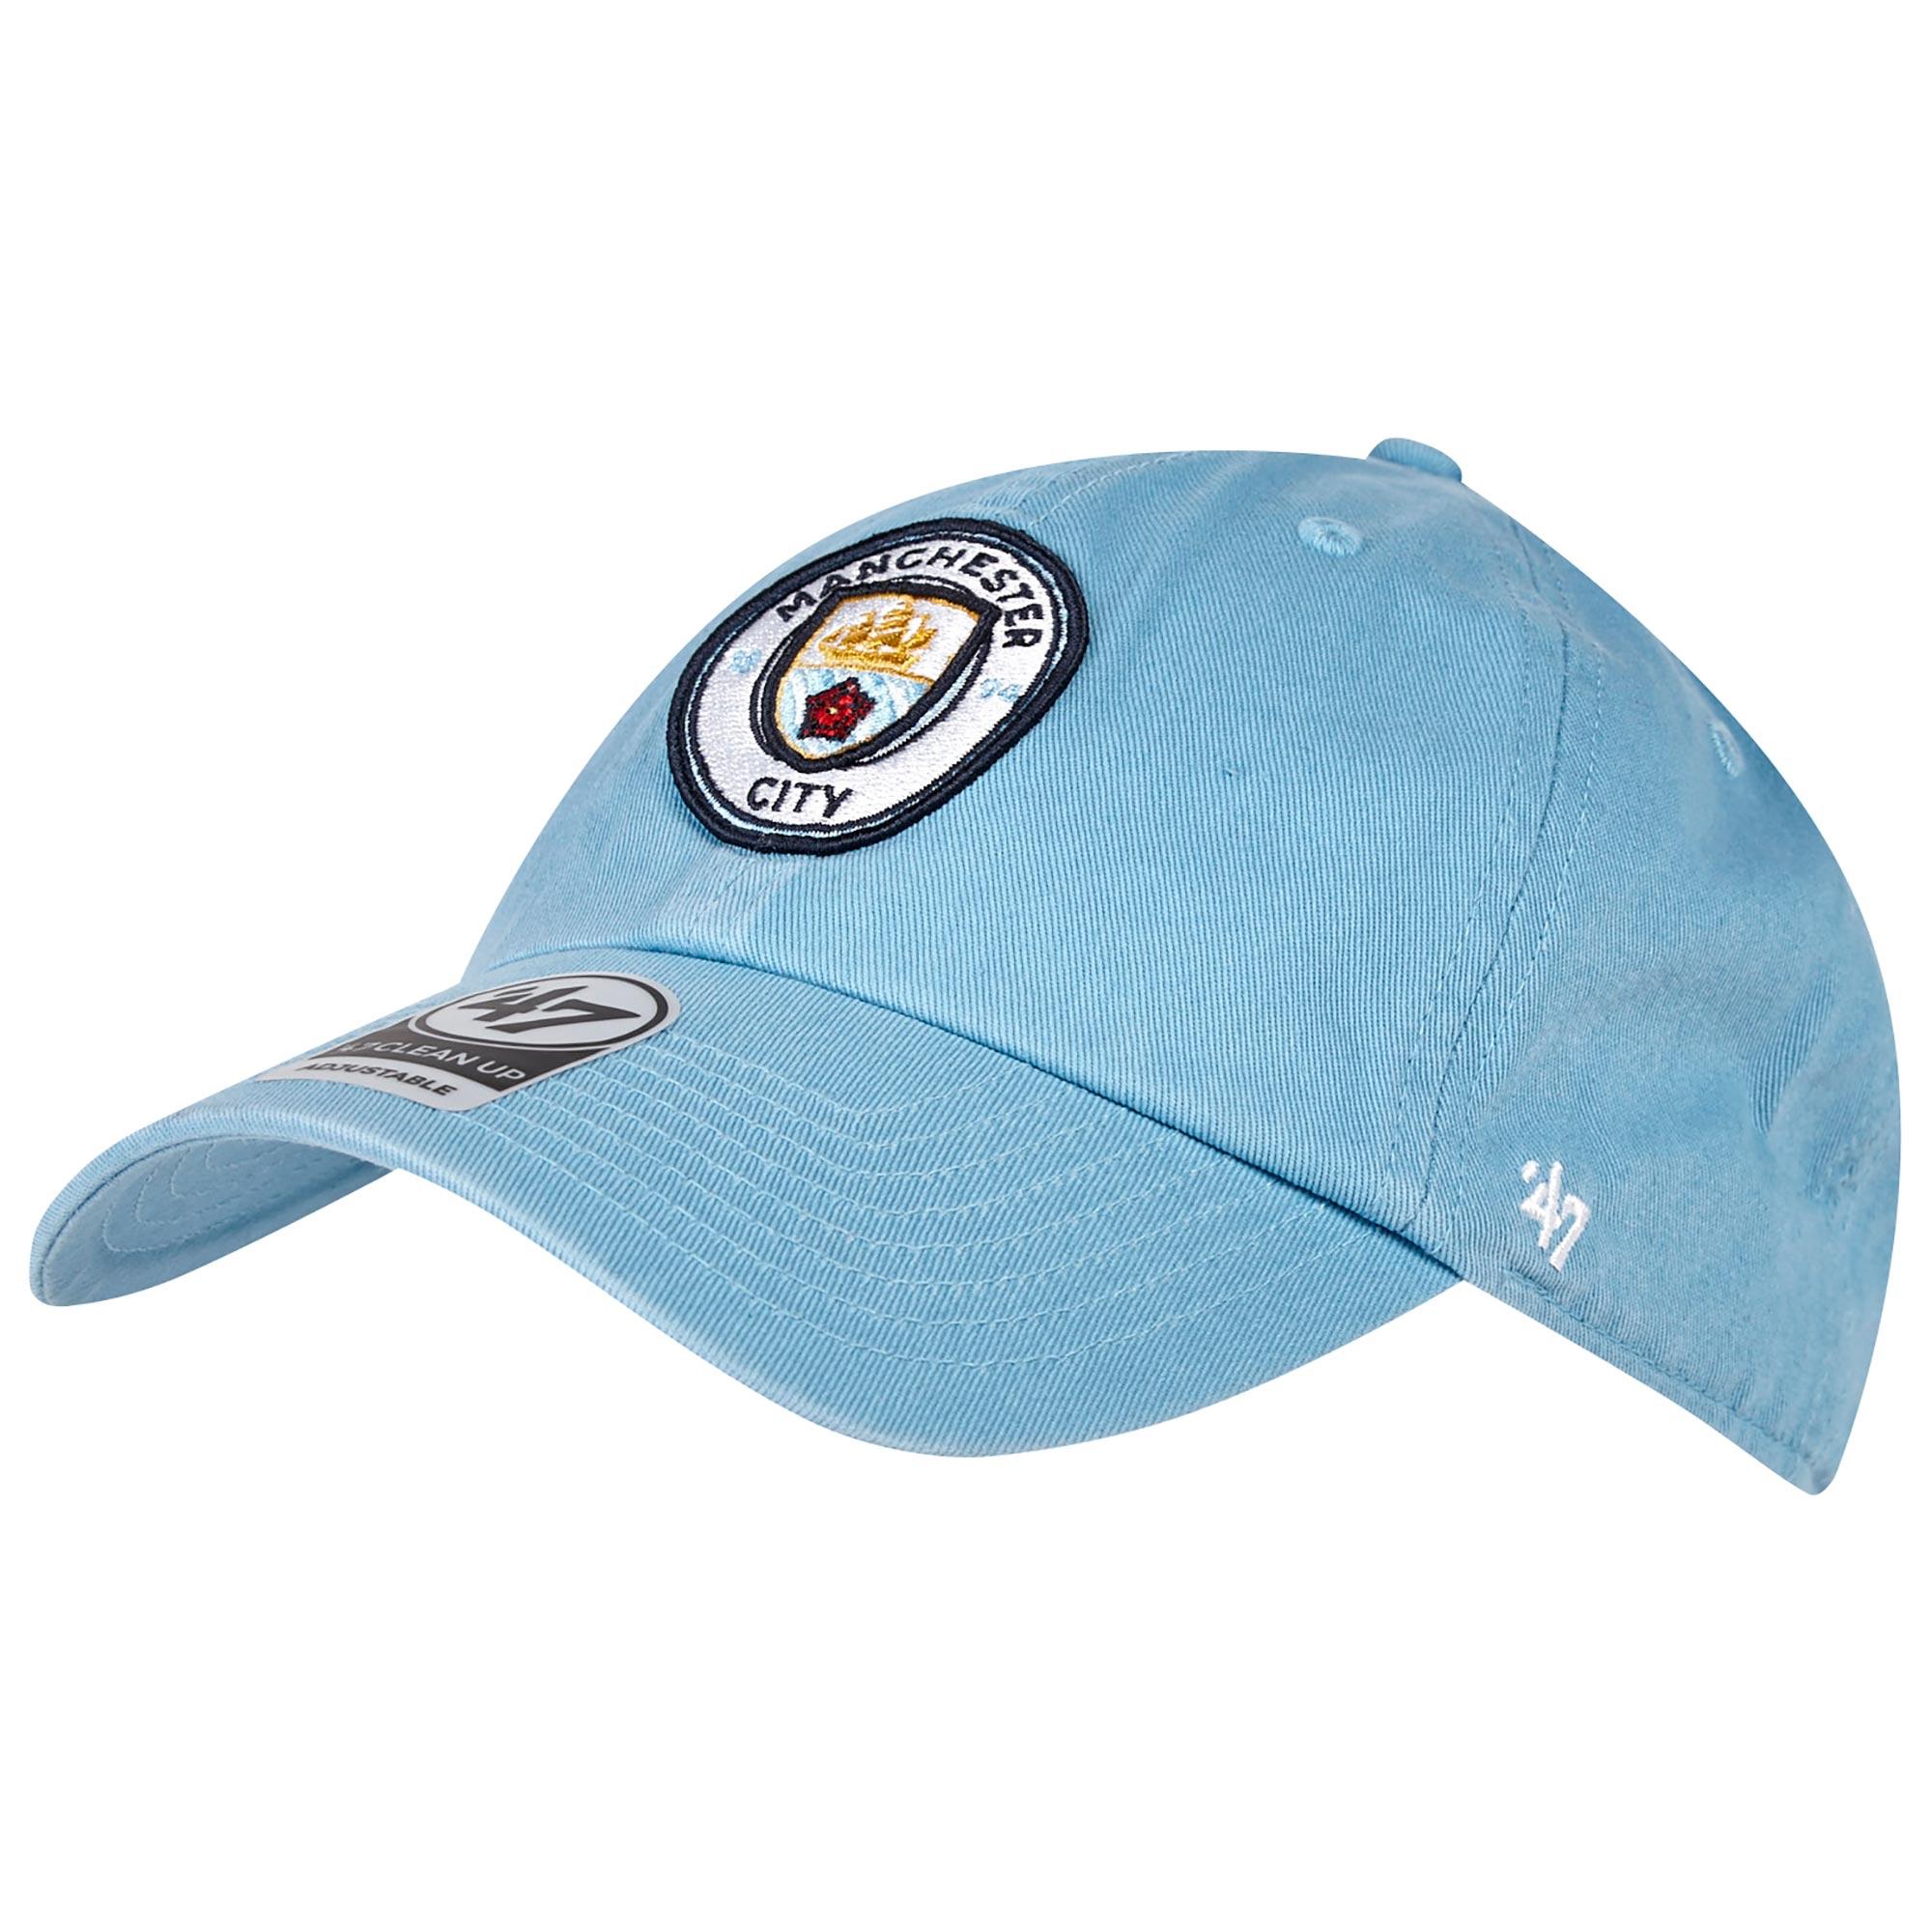 Manchester City 47 Rebound Cap - Sky